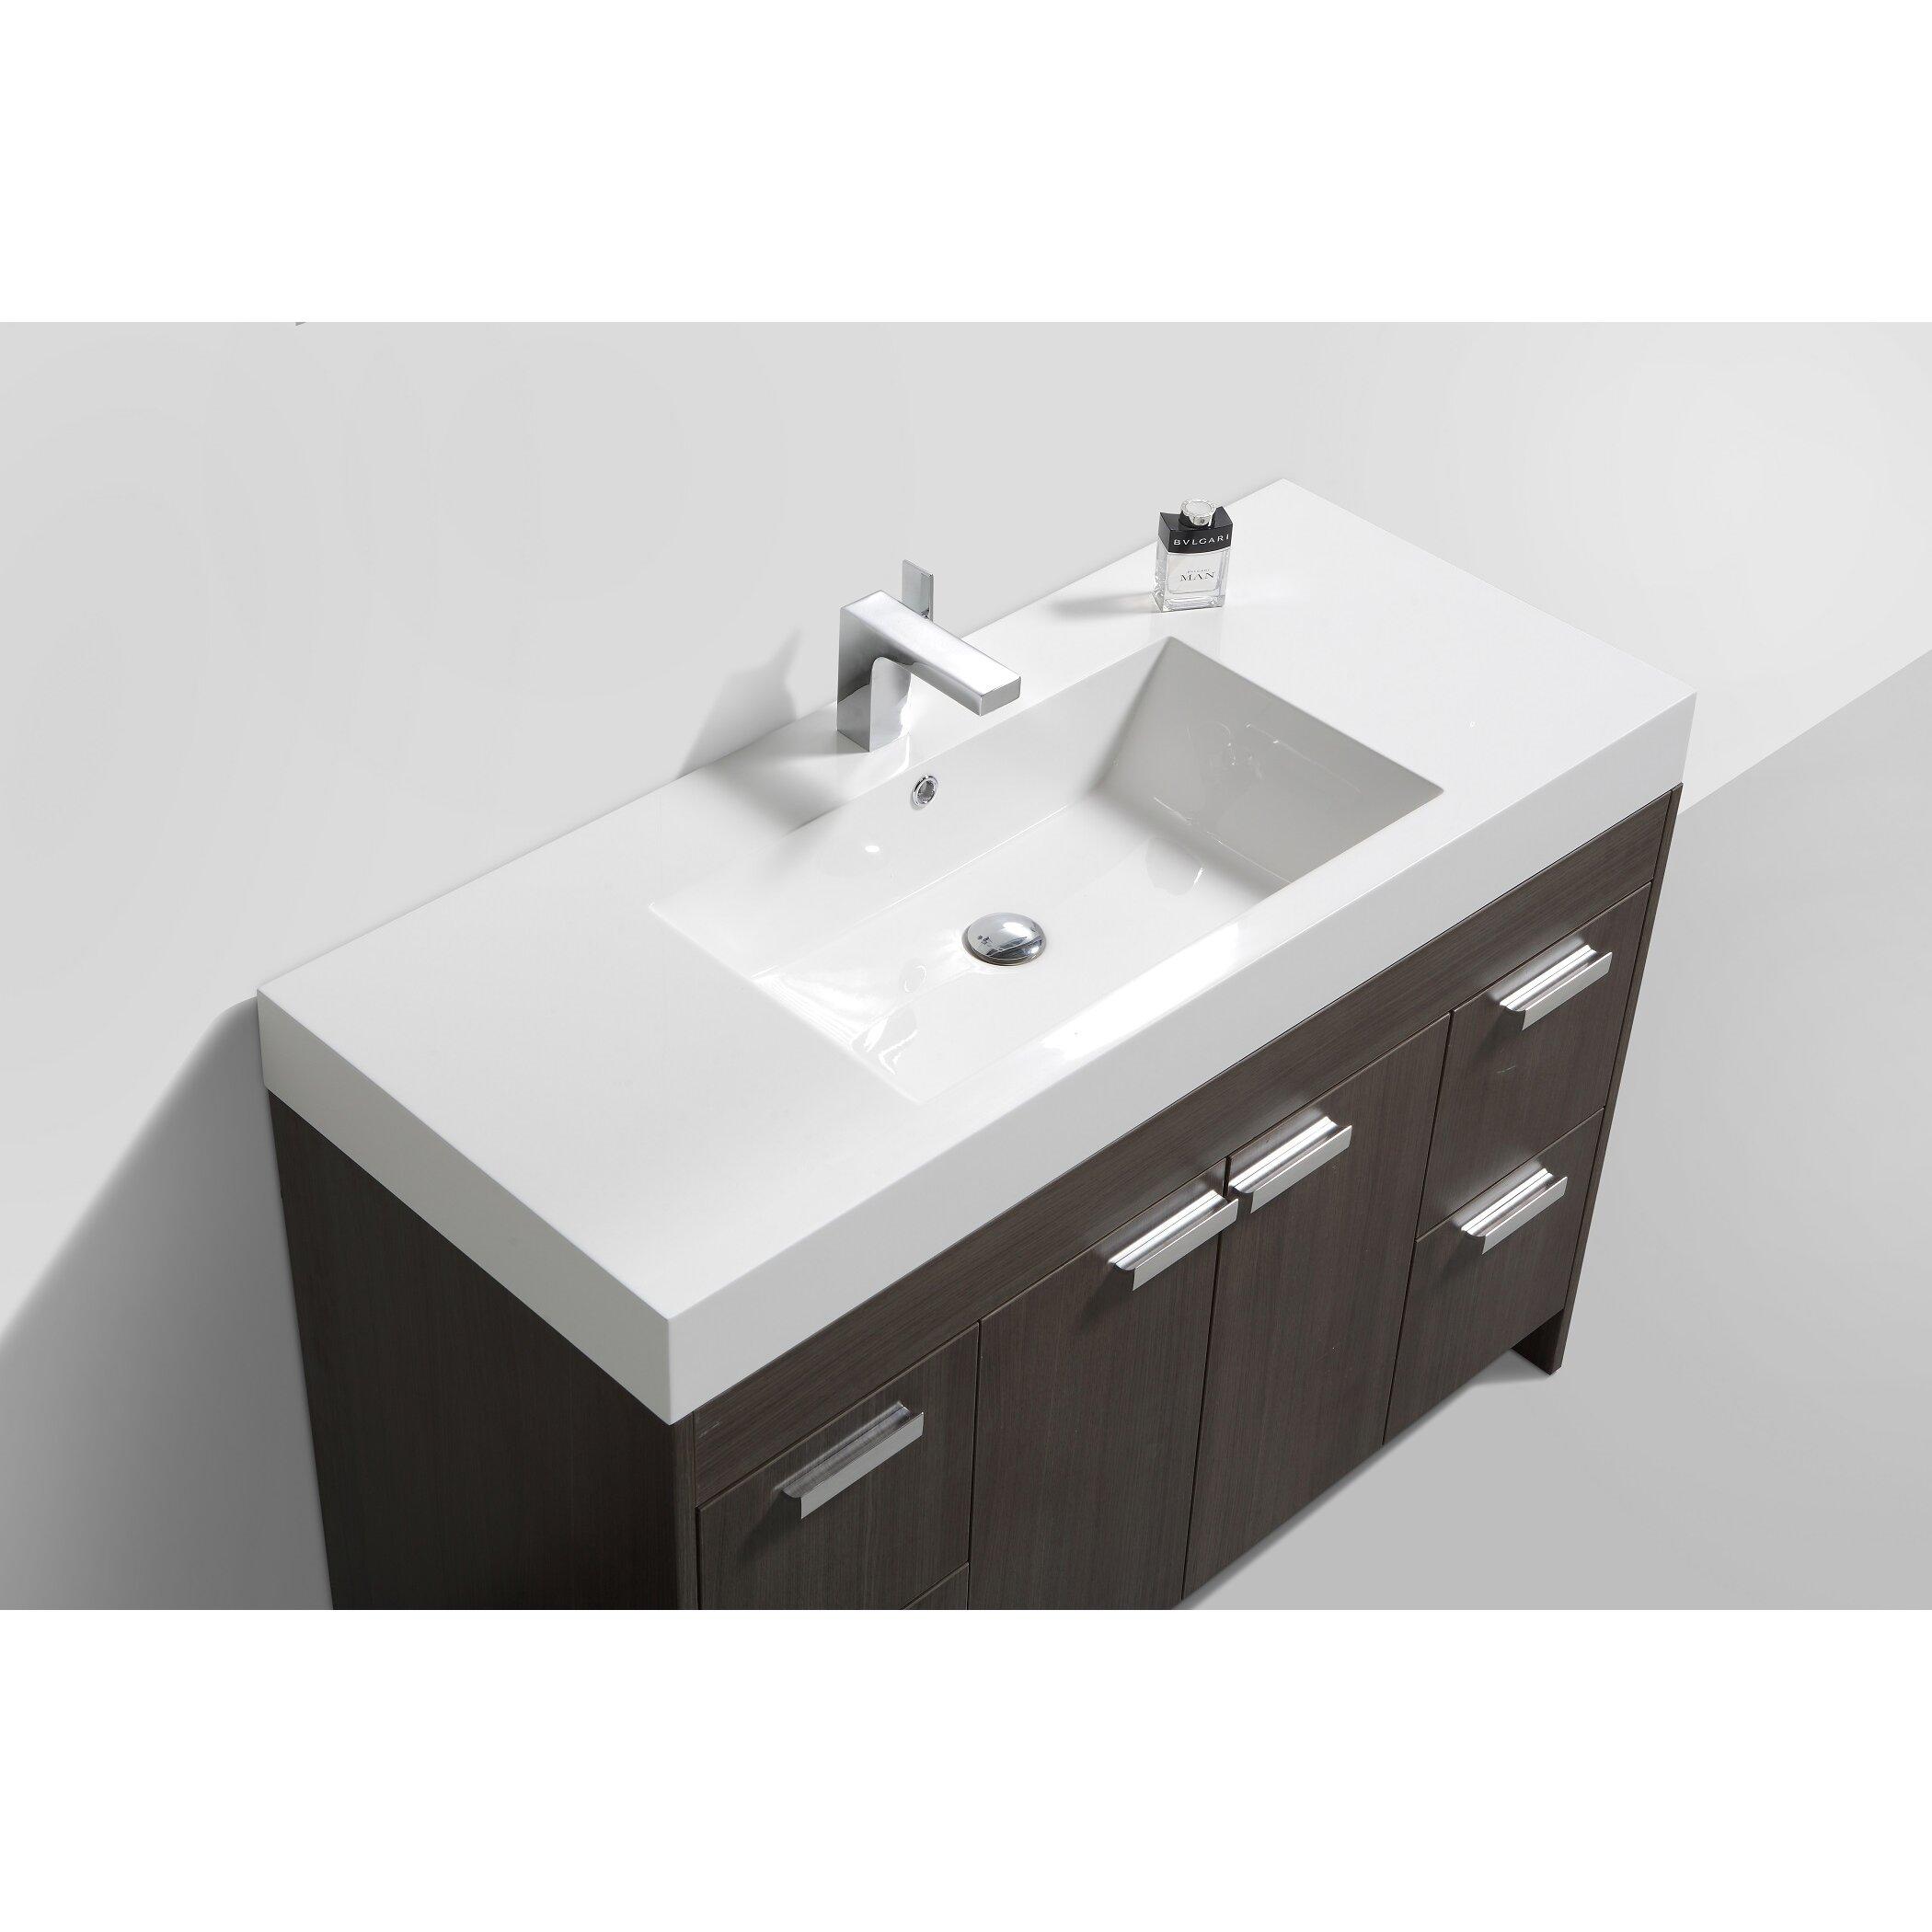 Bathroom Vanities Woodbridge Eviva Lugano 48 Single Bathroom Vanity Set Reviews Wayfair